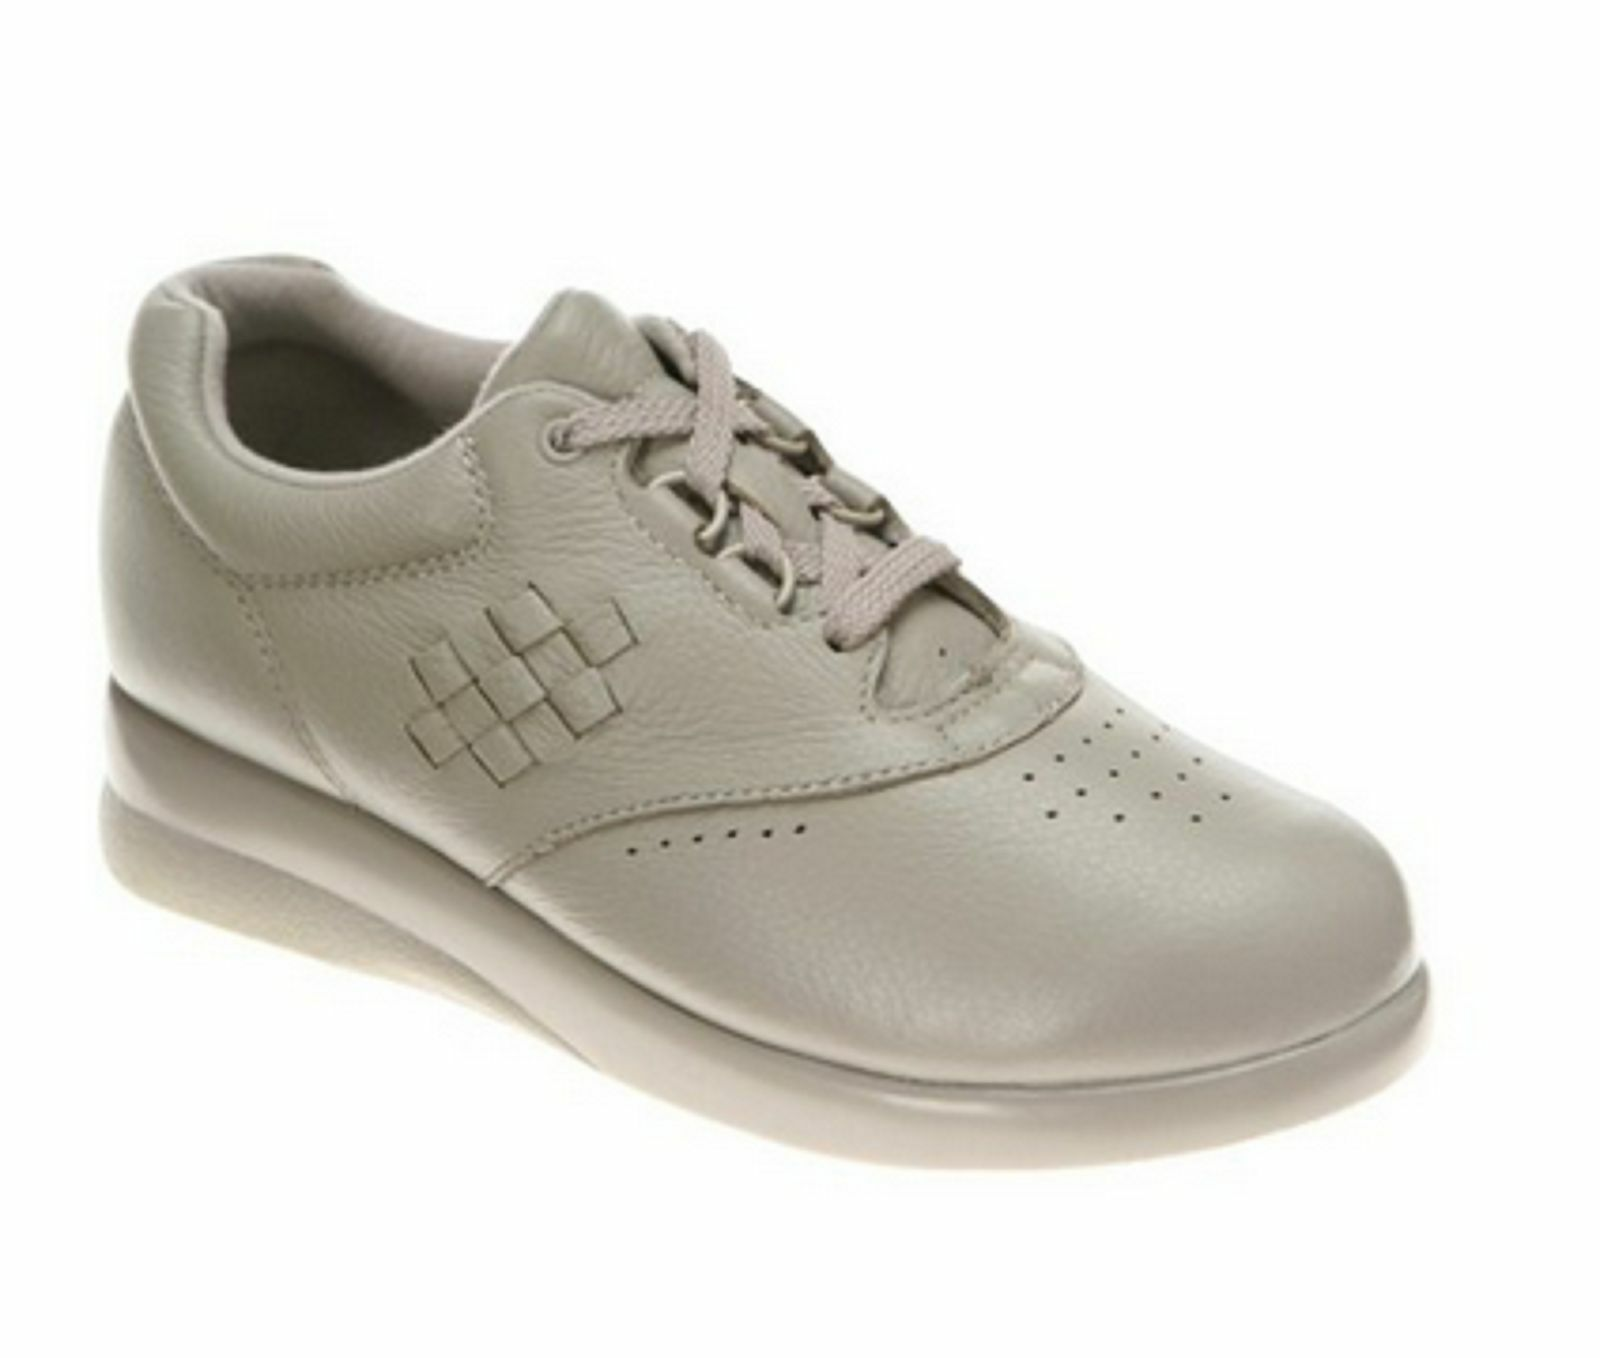 P.W. Minor Women's Leisure shoes, Clay, Size US 6.5 W , EUR 37